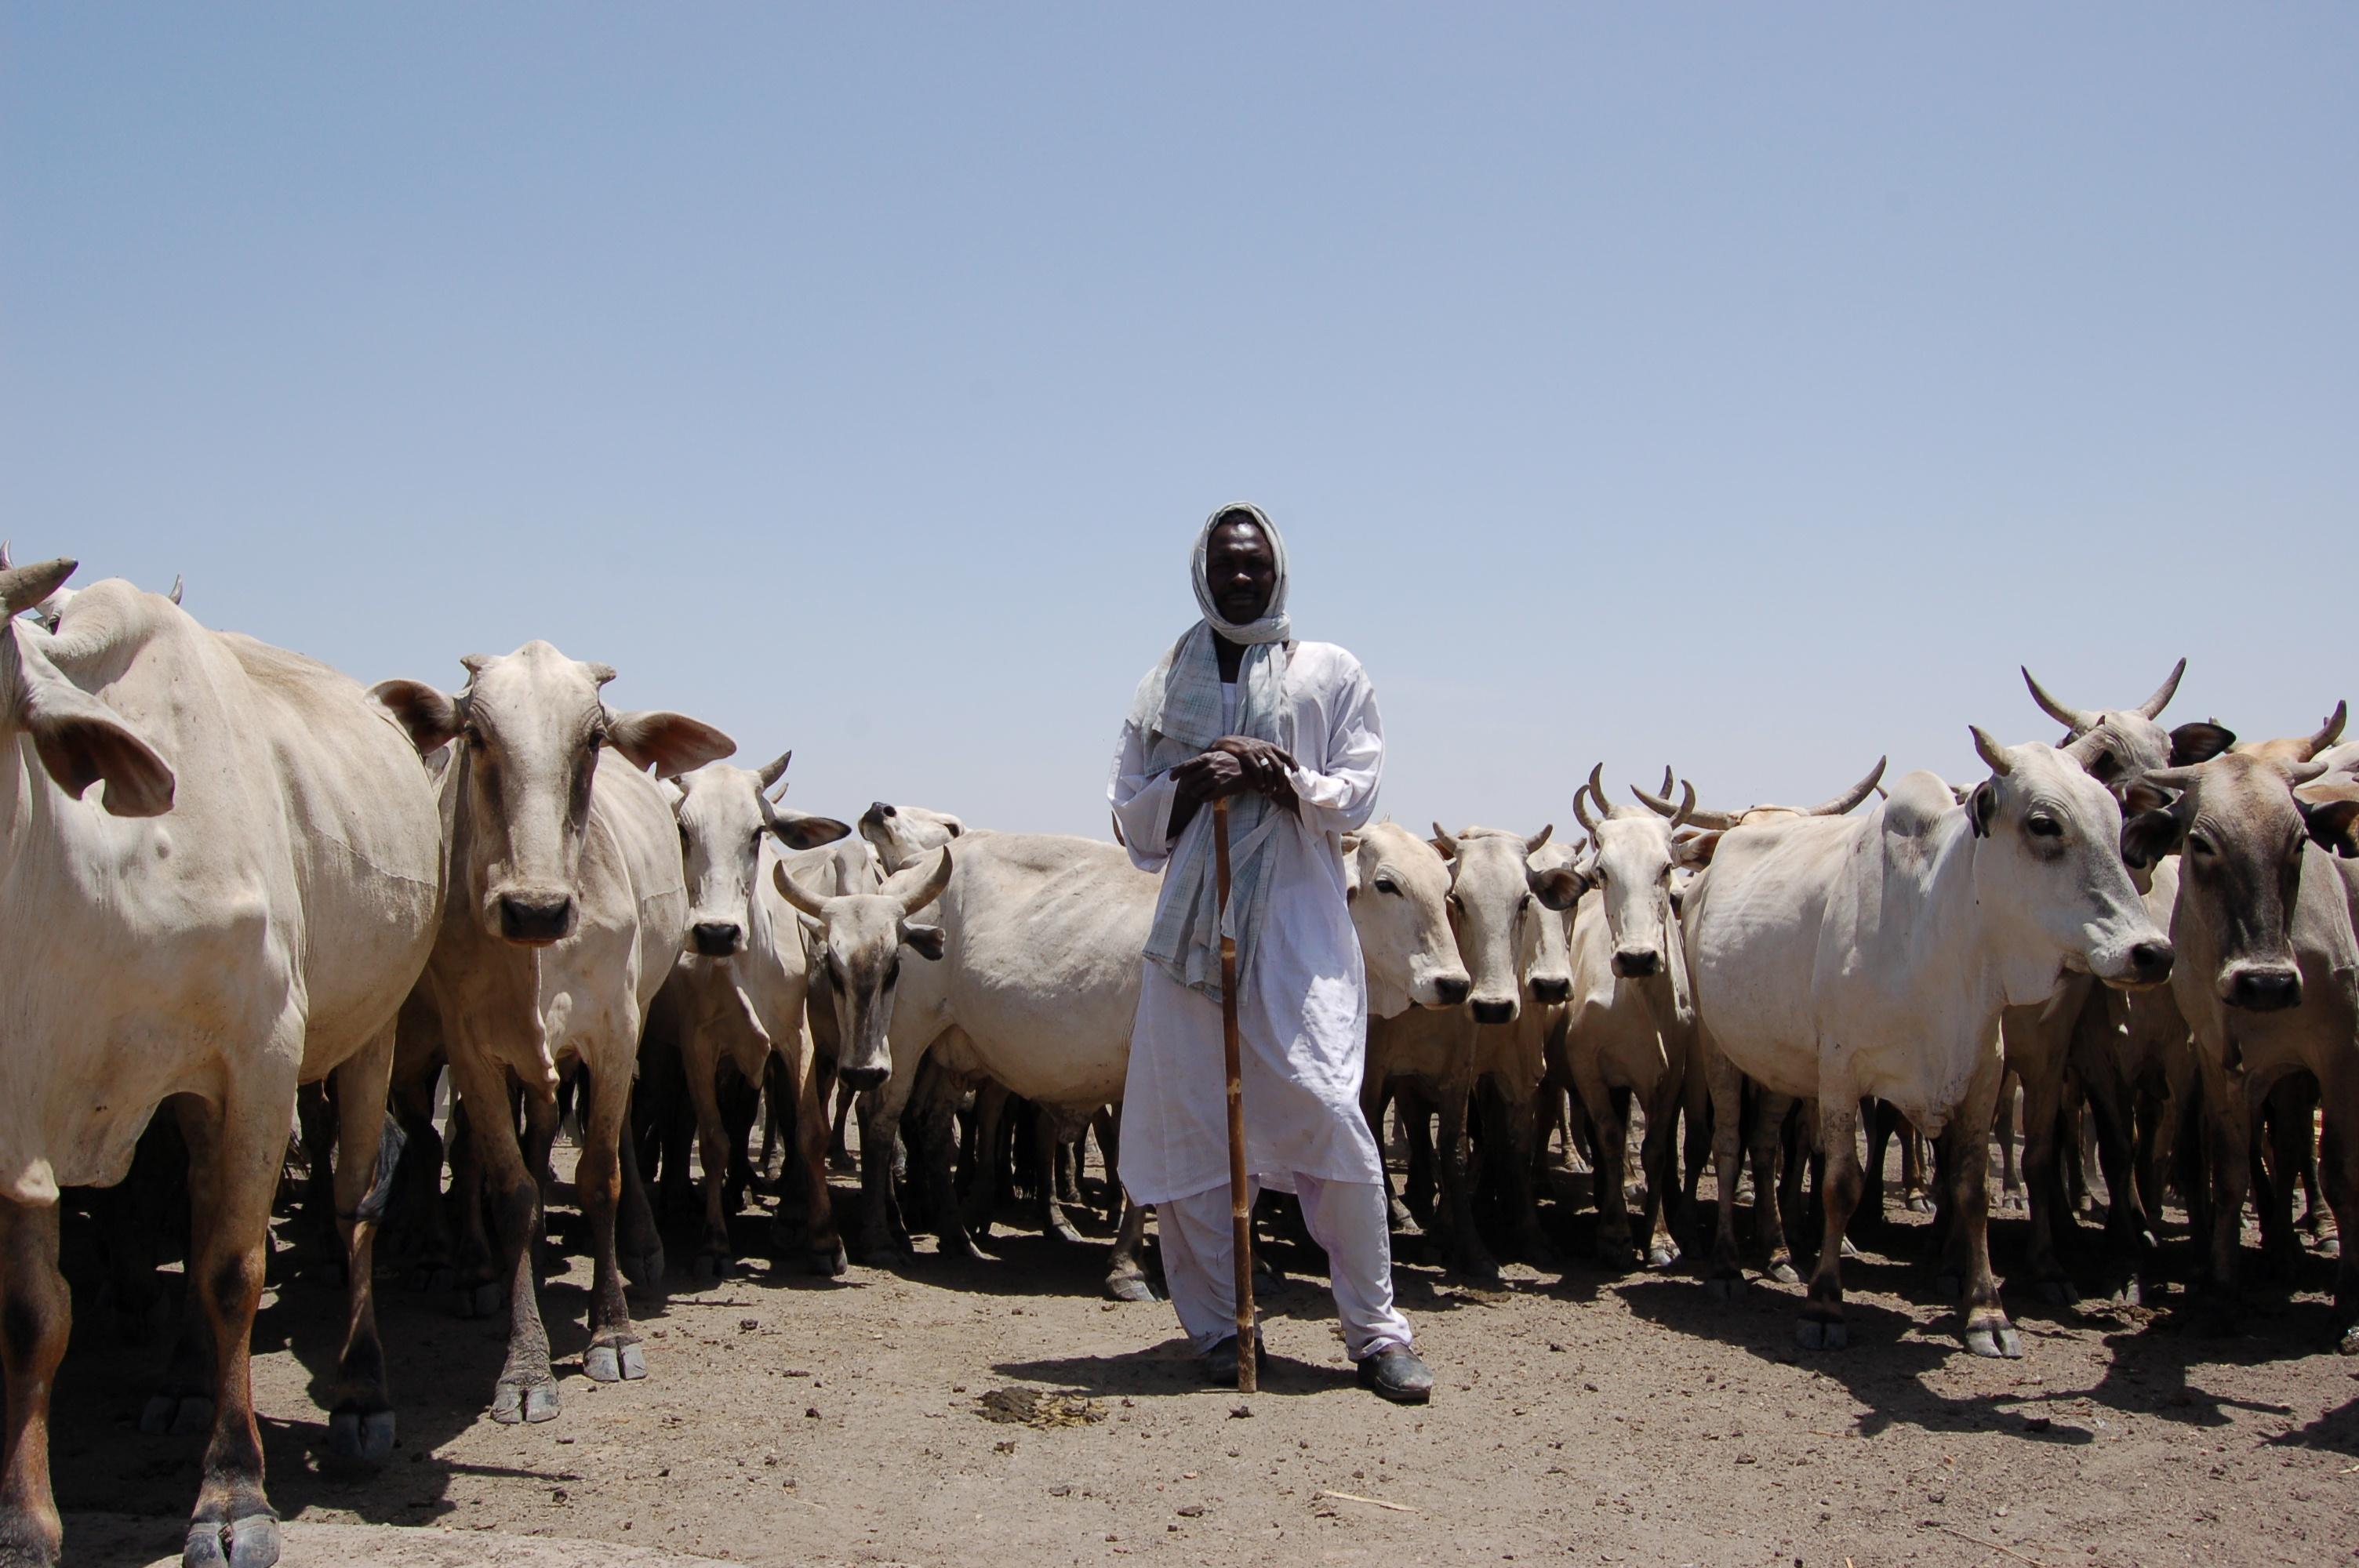 Farmer Harvesting Seeds Sudan 134570